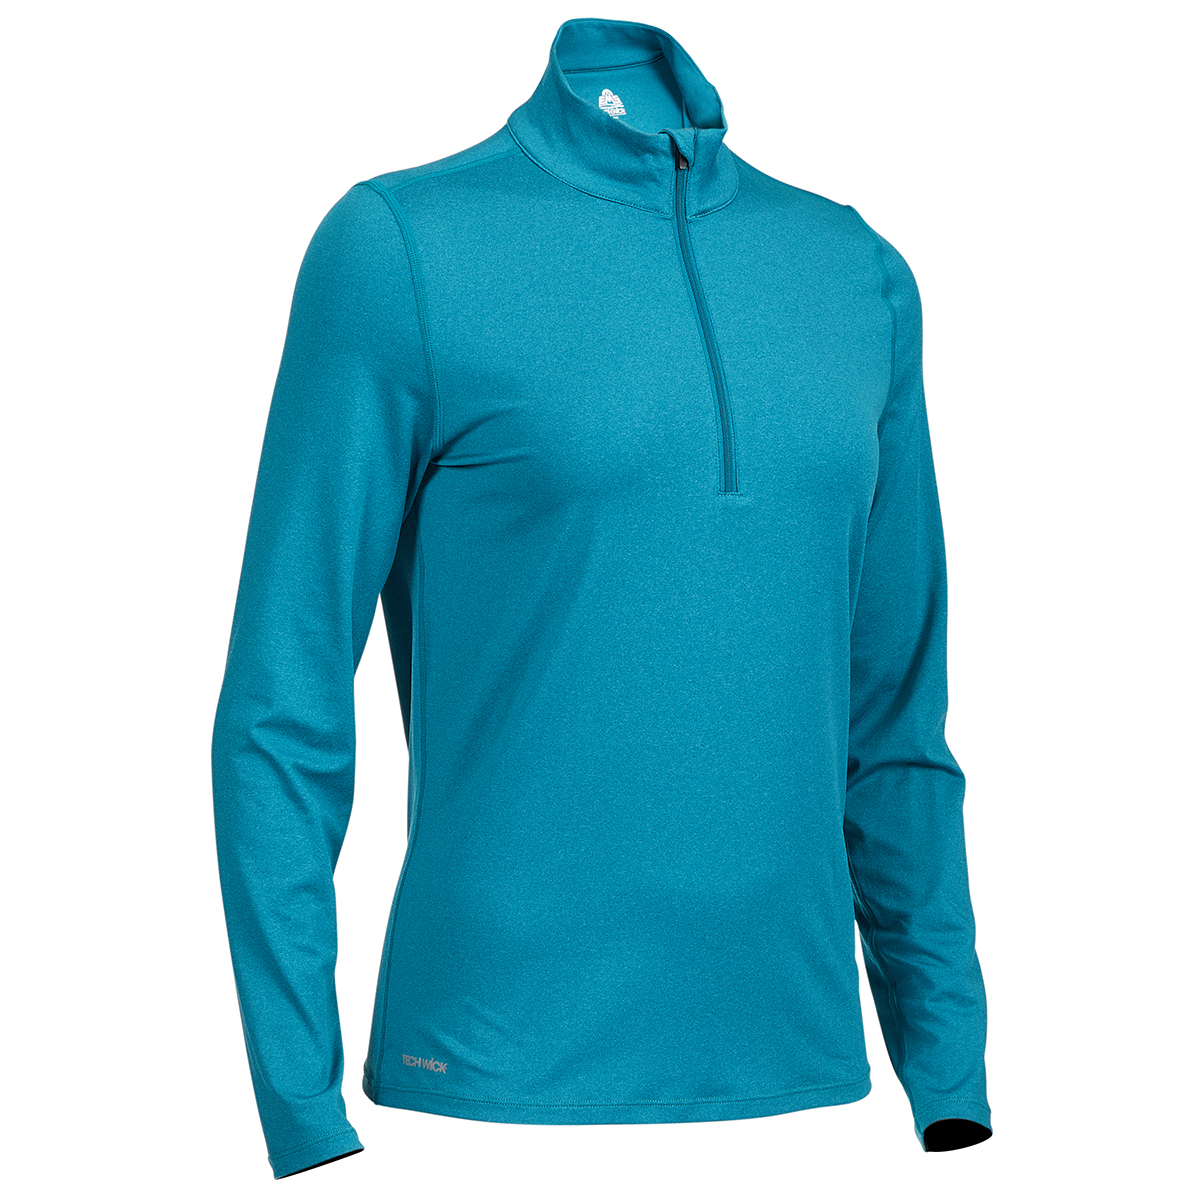 Ems Women's Long-Sleeve Essence Peak Quarter-Zip Technical Top - Green, XS